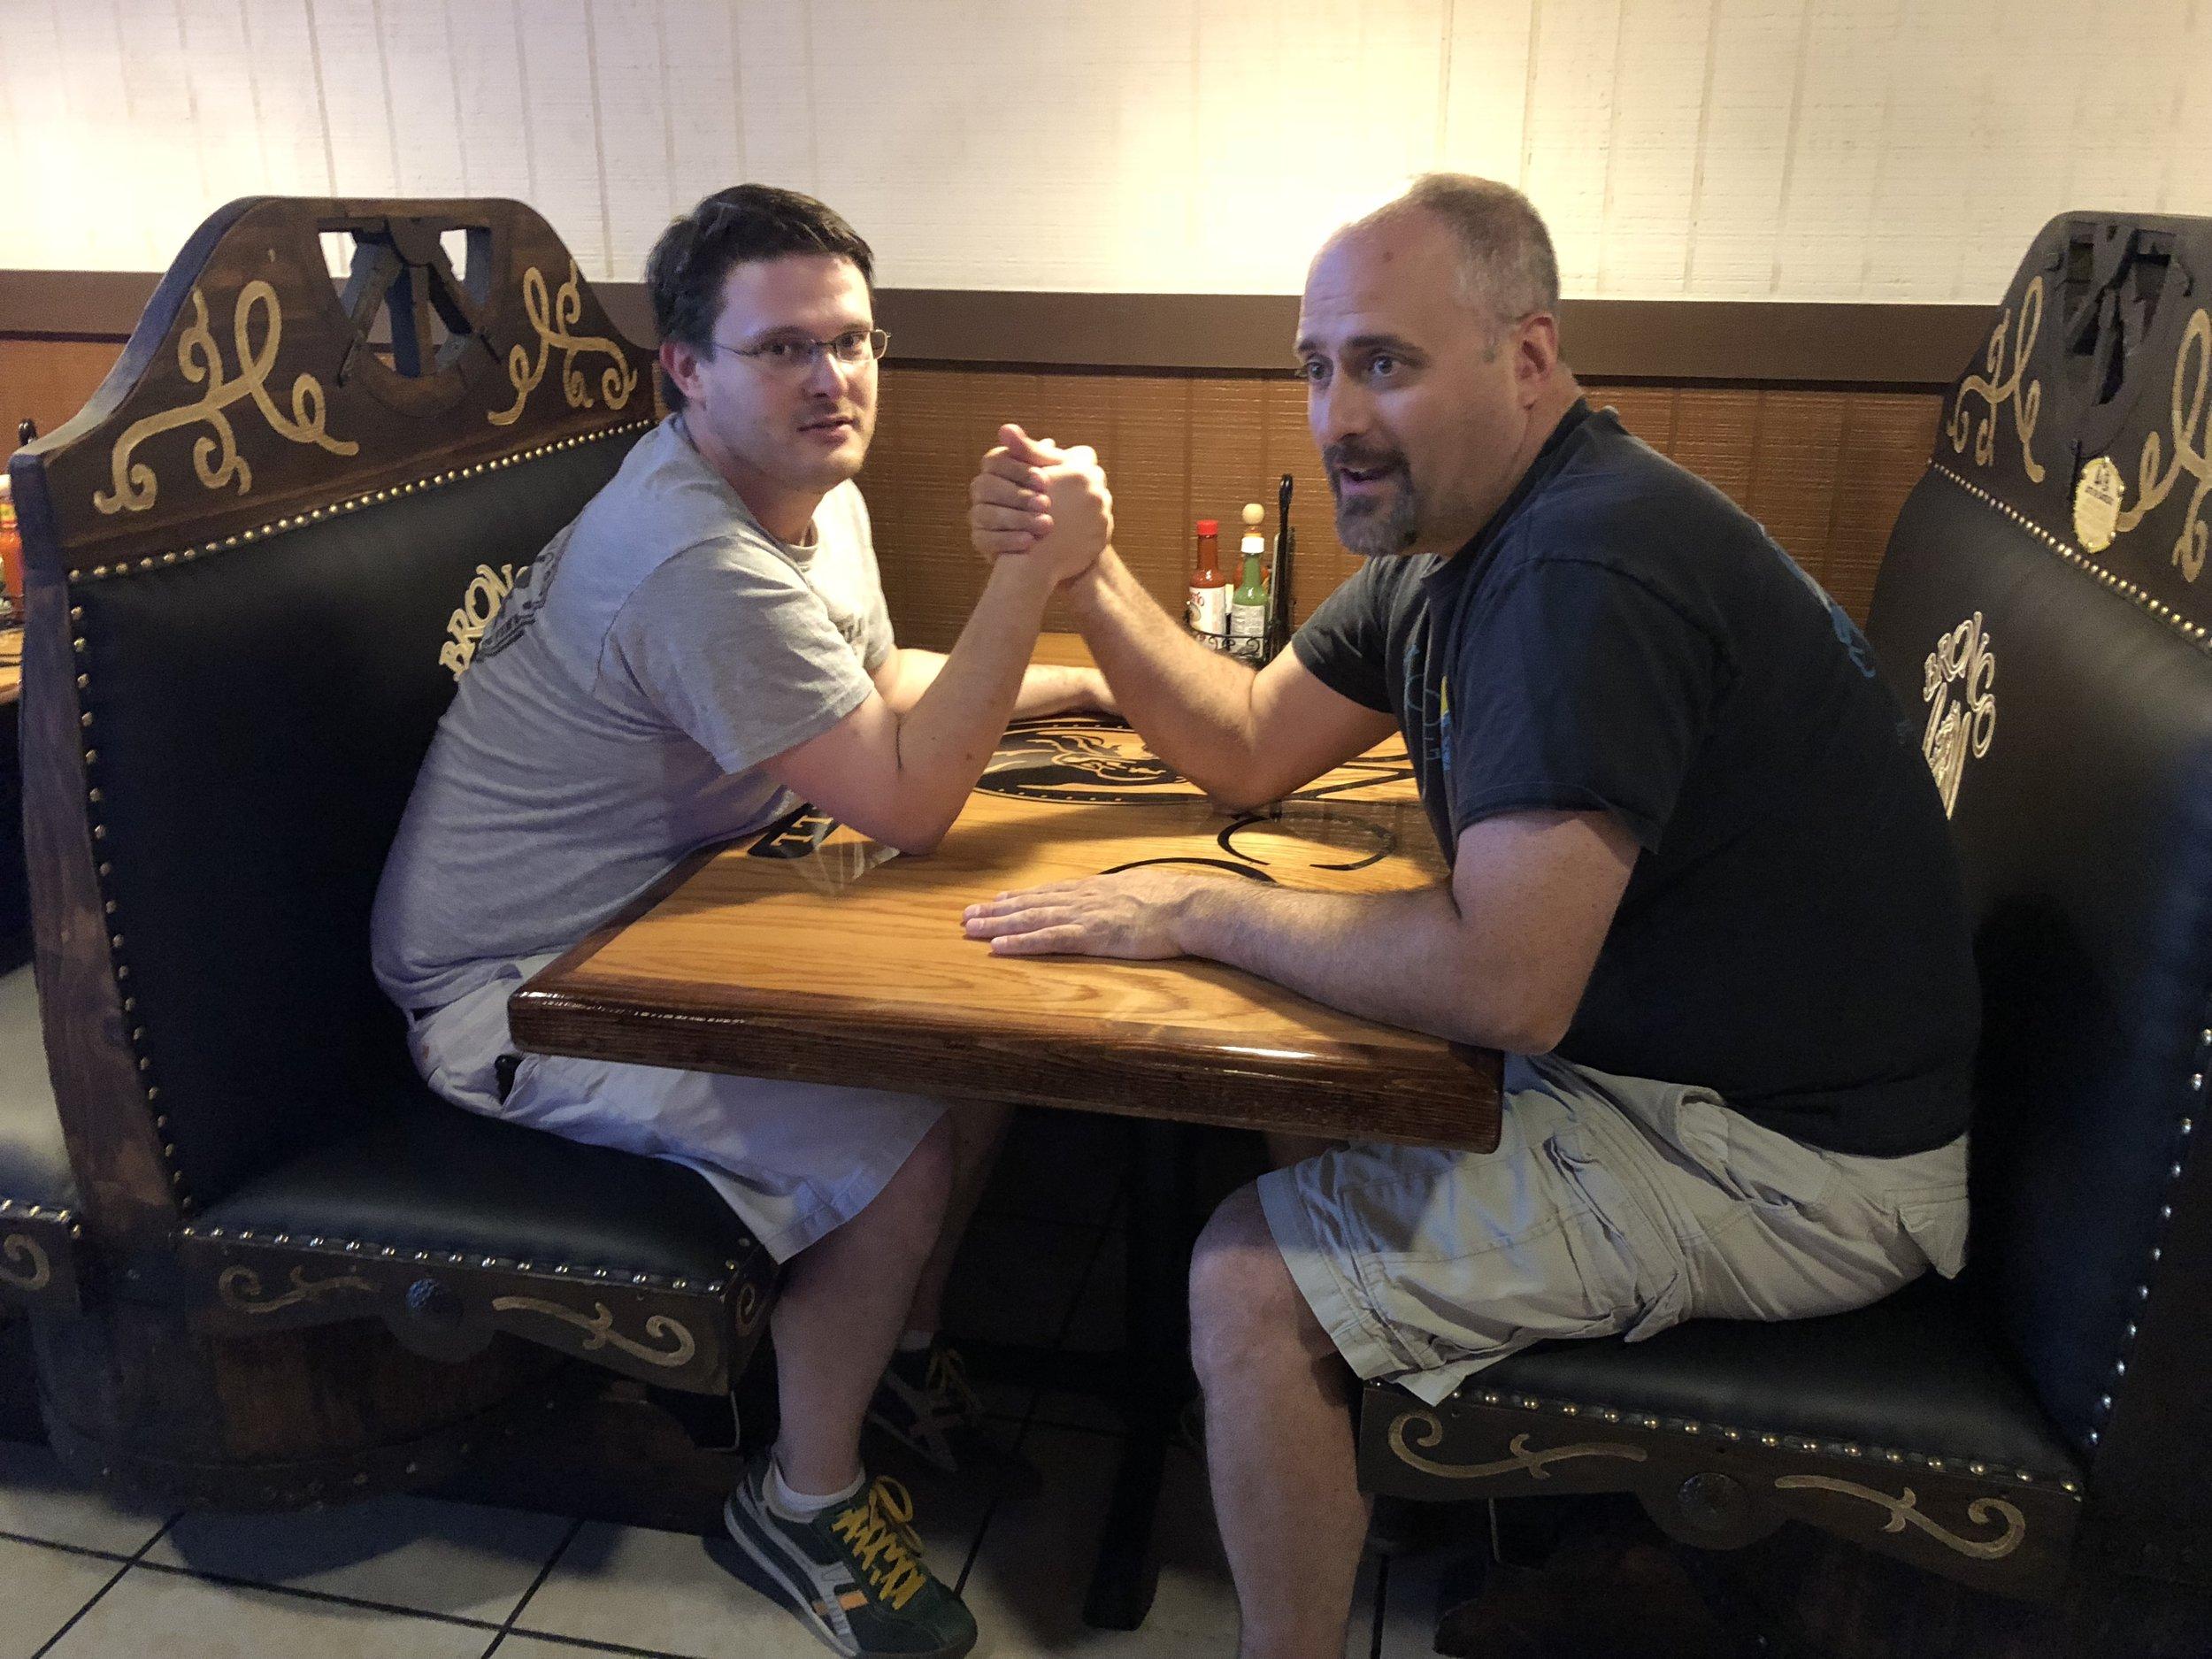 10 Nate friend arm wrestling.jpg